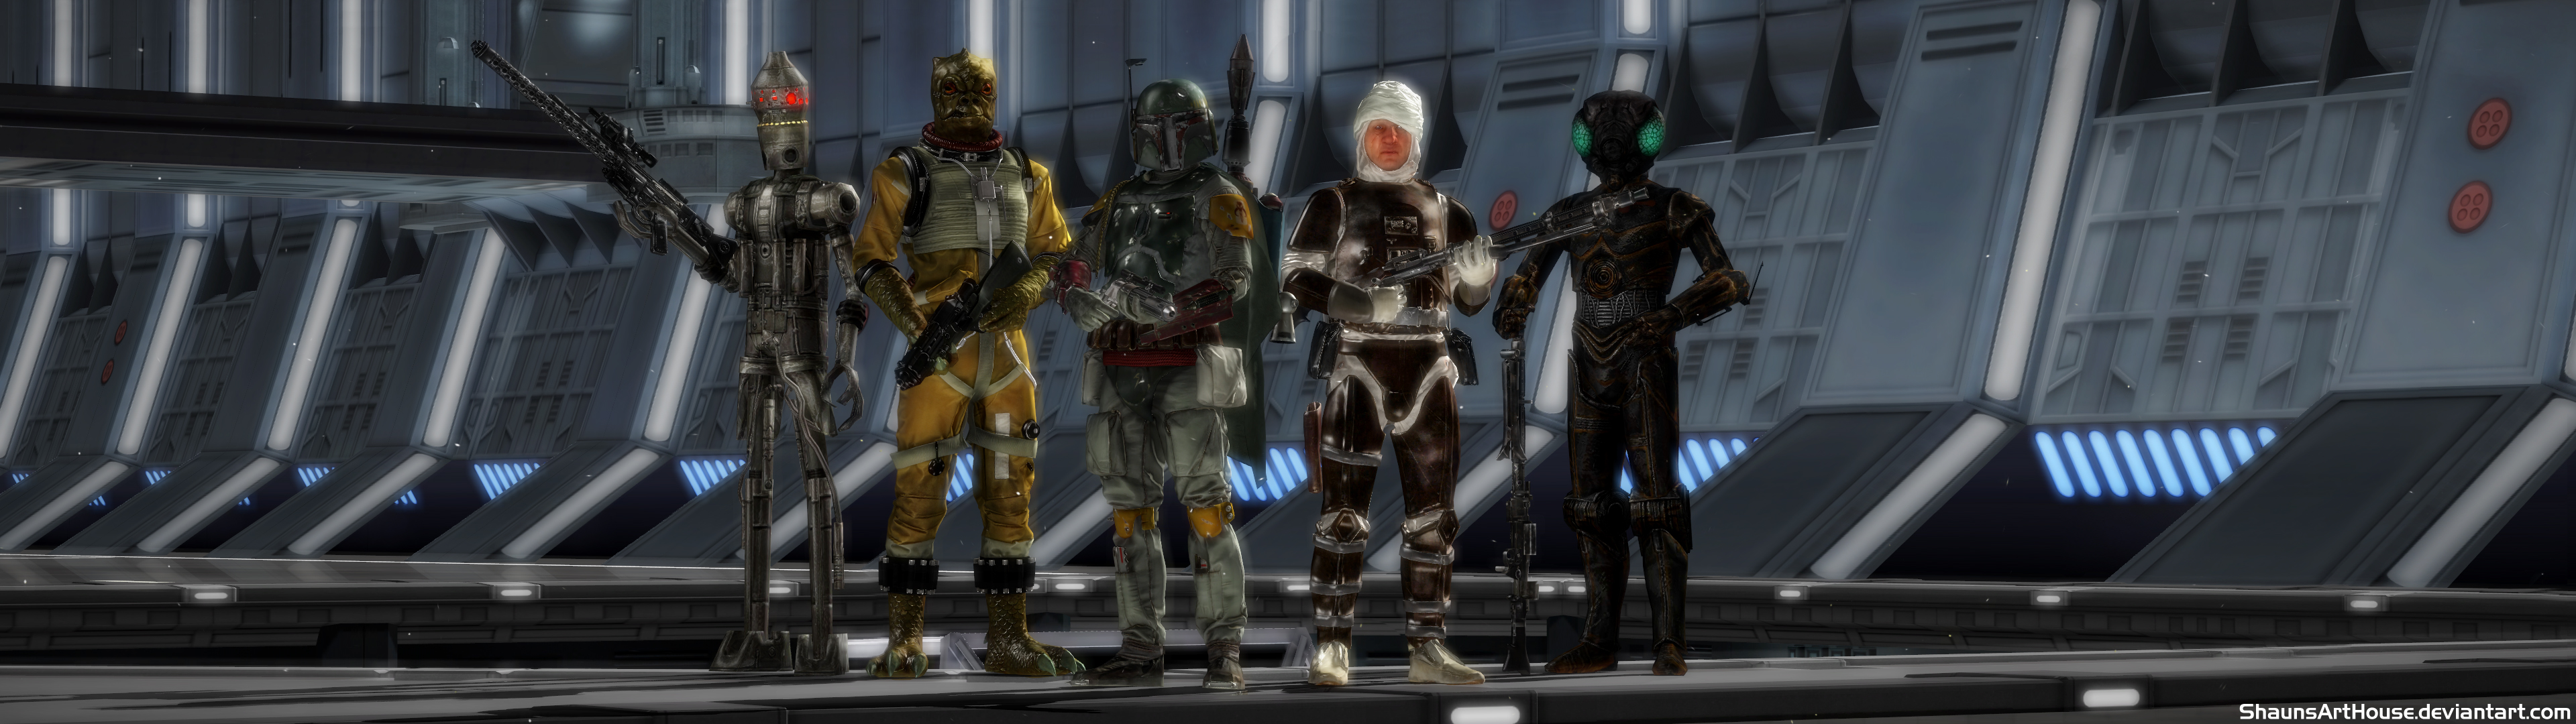 Star Wars Og Bounty Hunters Dual Screen Wallpaper By Shaunsarthouse On Deviantart